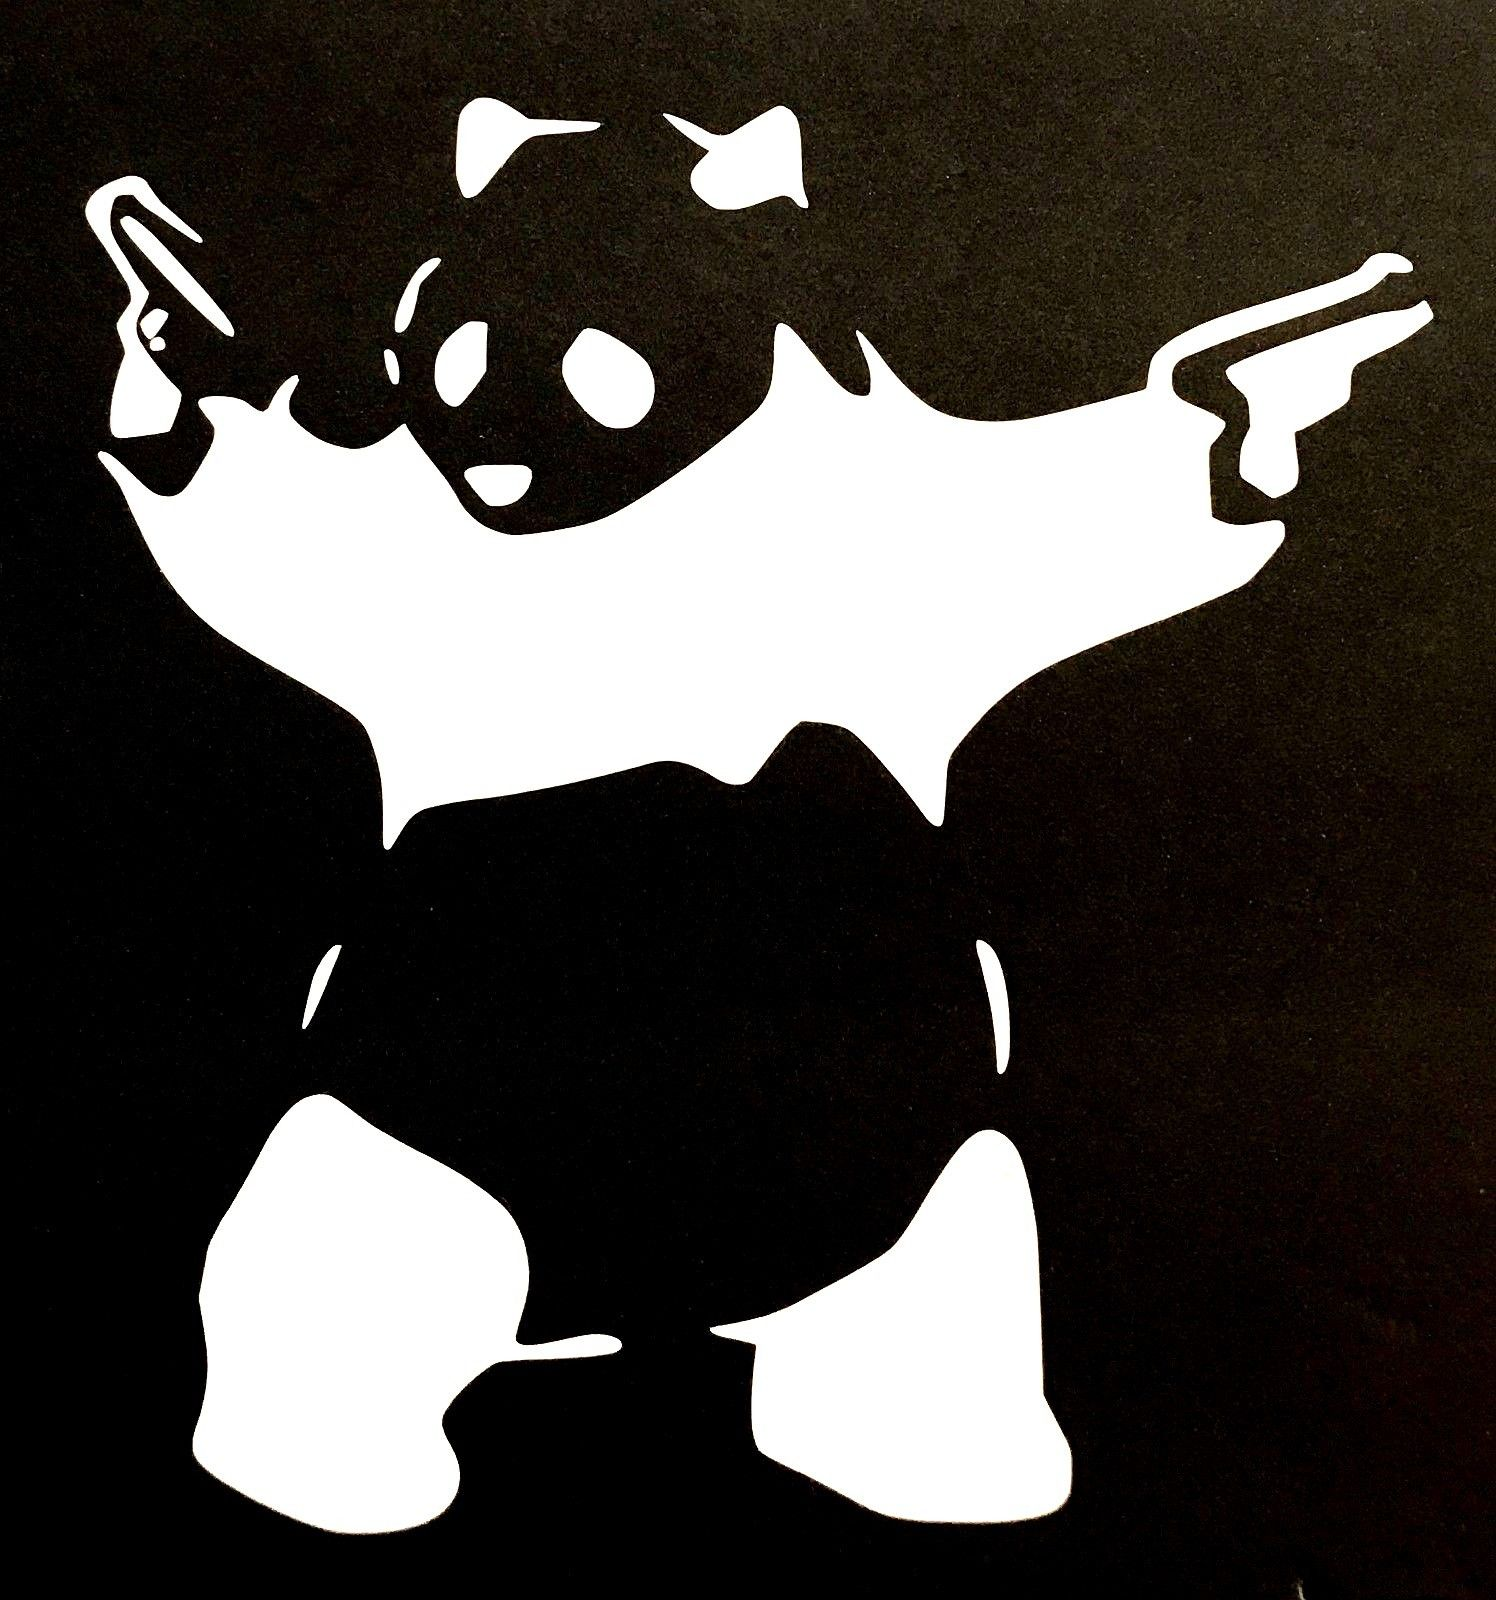 JDM Panda Racing HF Vinyl Motorcycle Car Sticker Decal Decoration